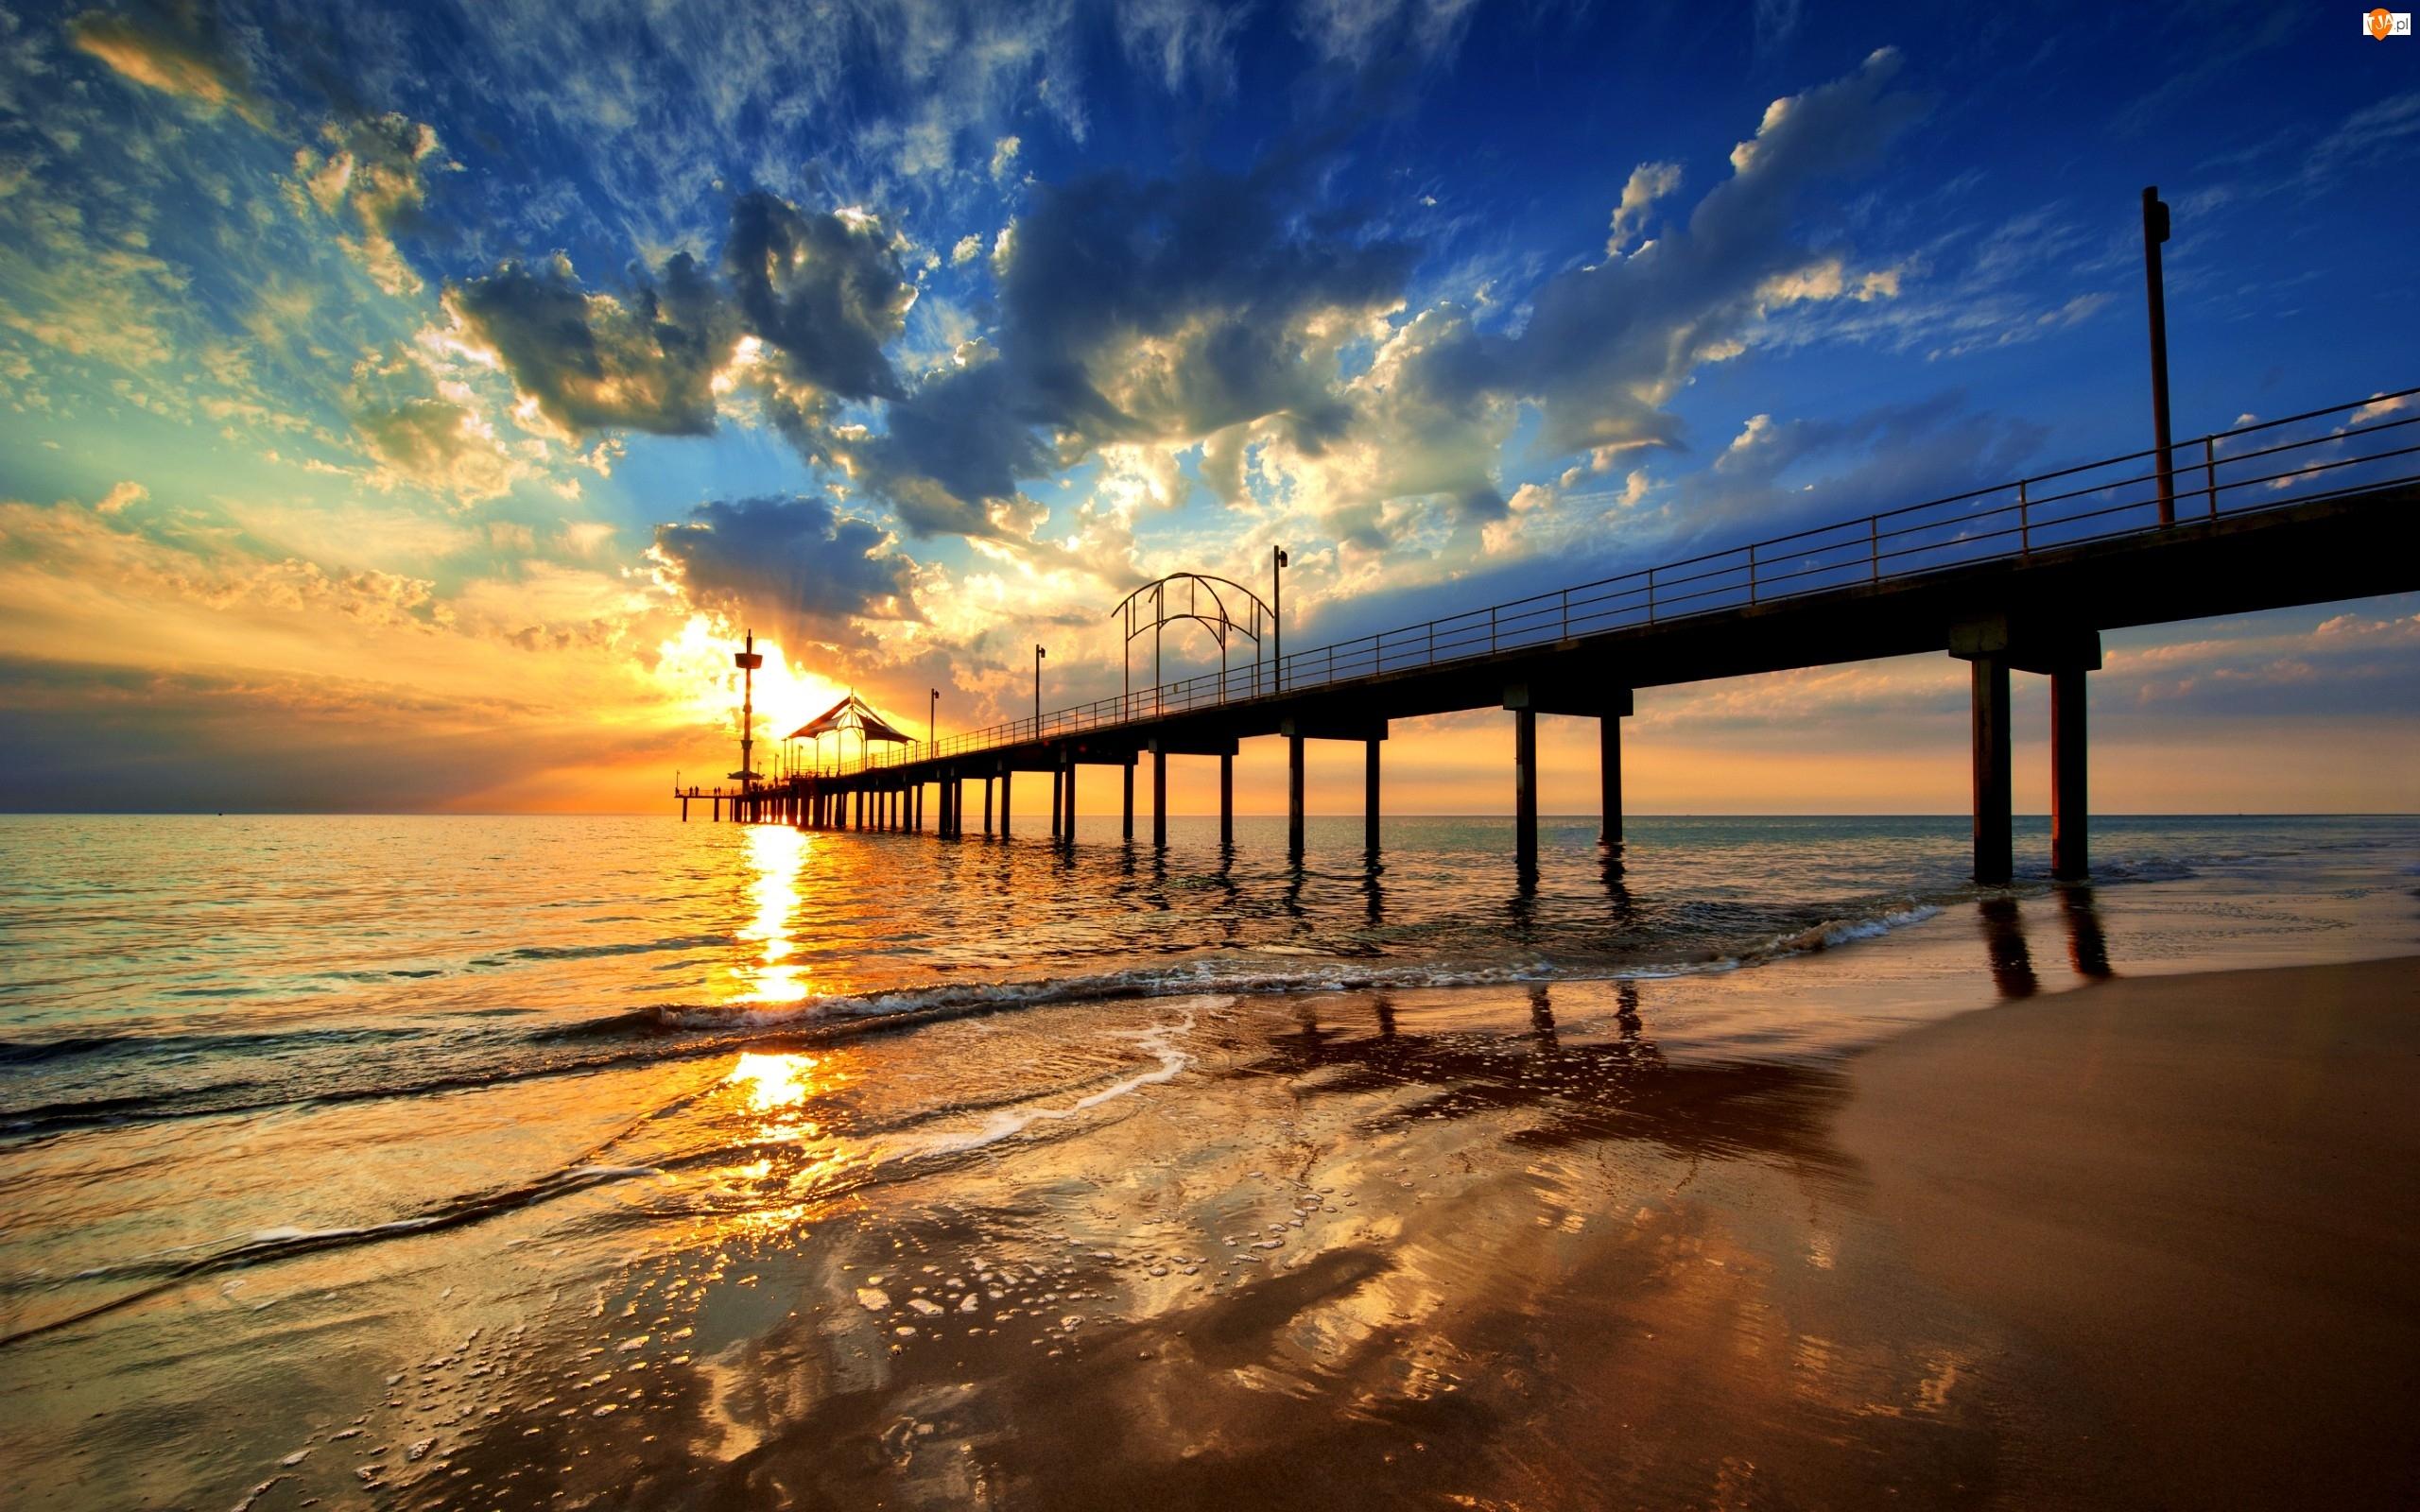 Morze, Chmury, Zachód słońca, Molo